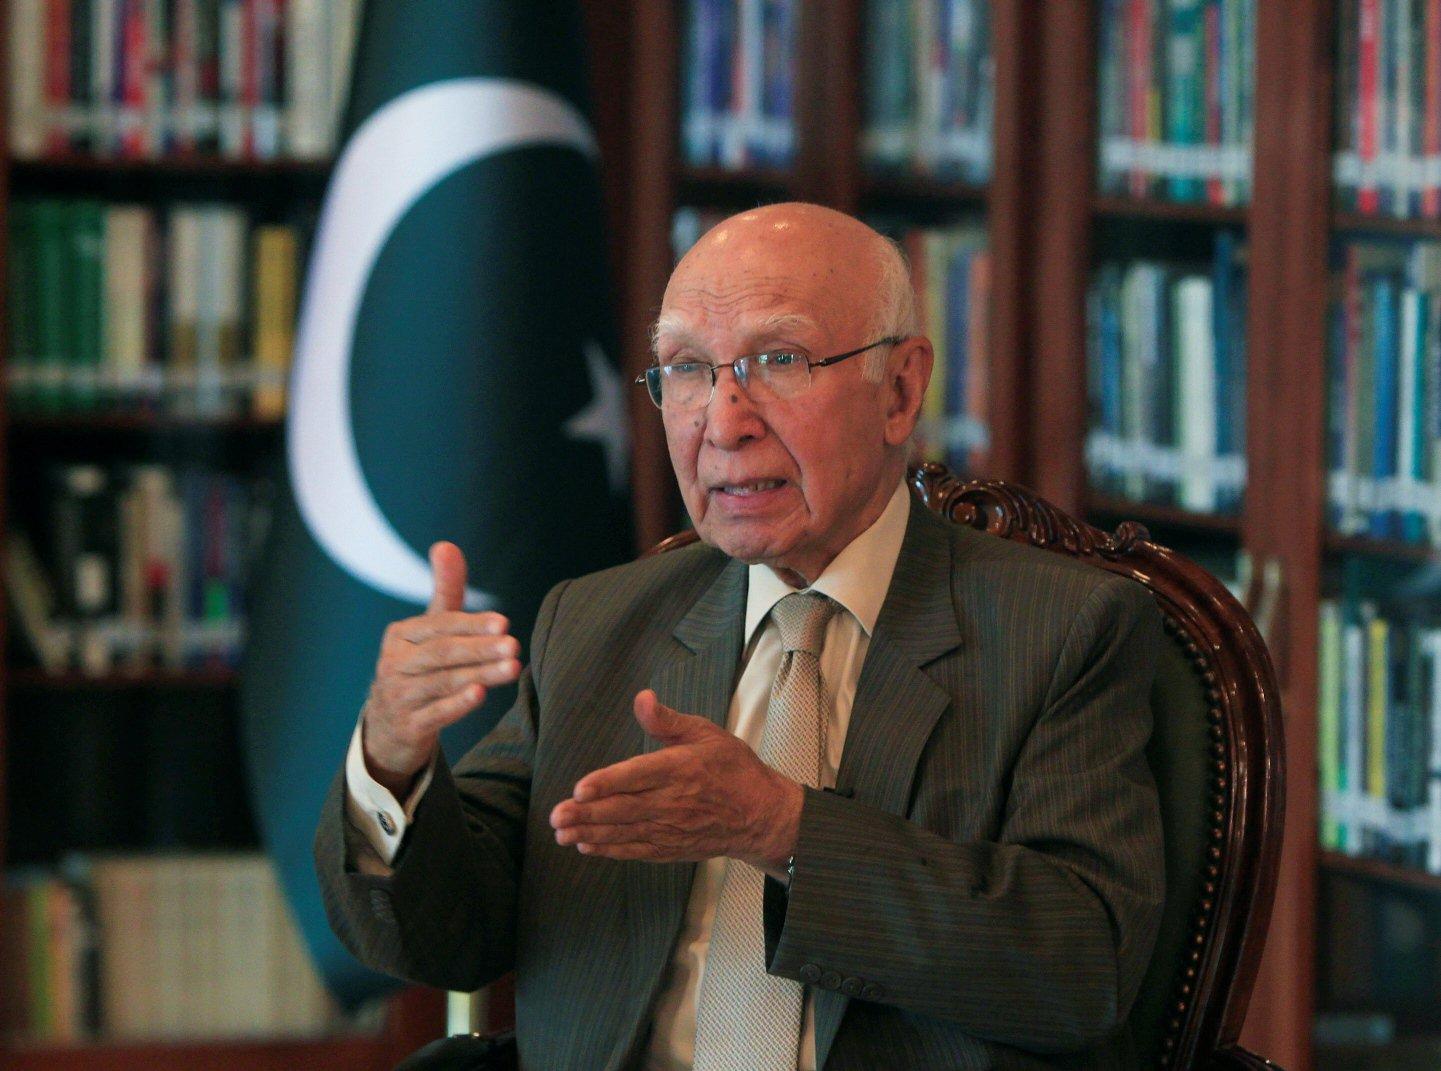 Prime Minister's Adviser on Foreign Affairs Sartaj Aziz. PHOTO: Reuters